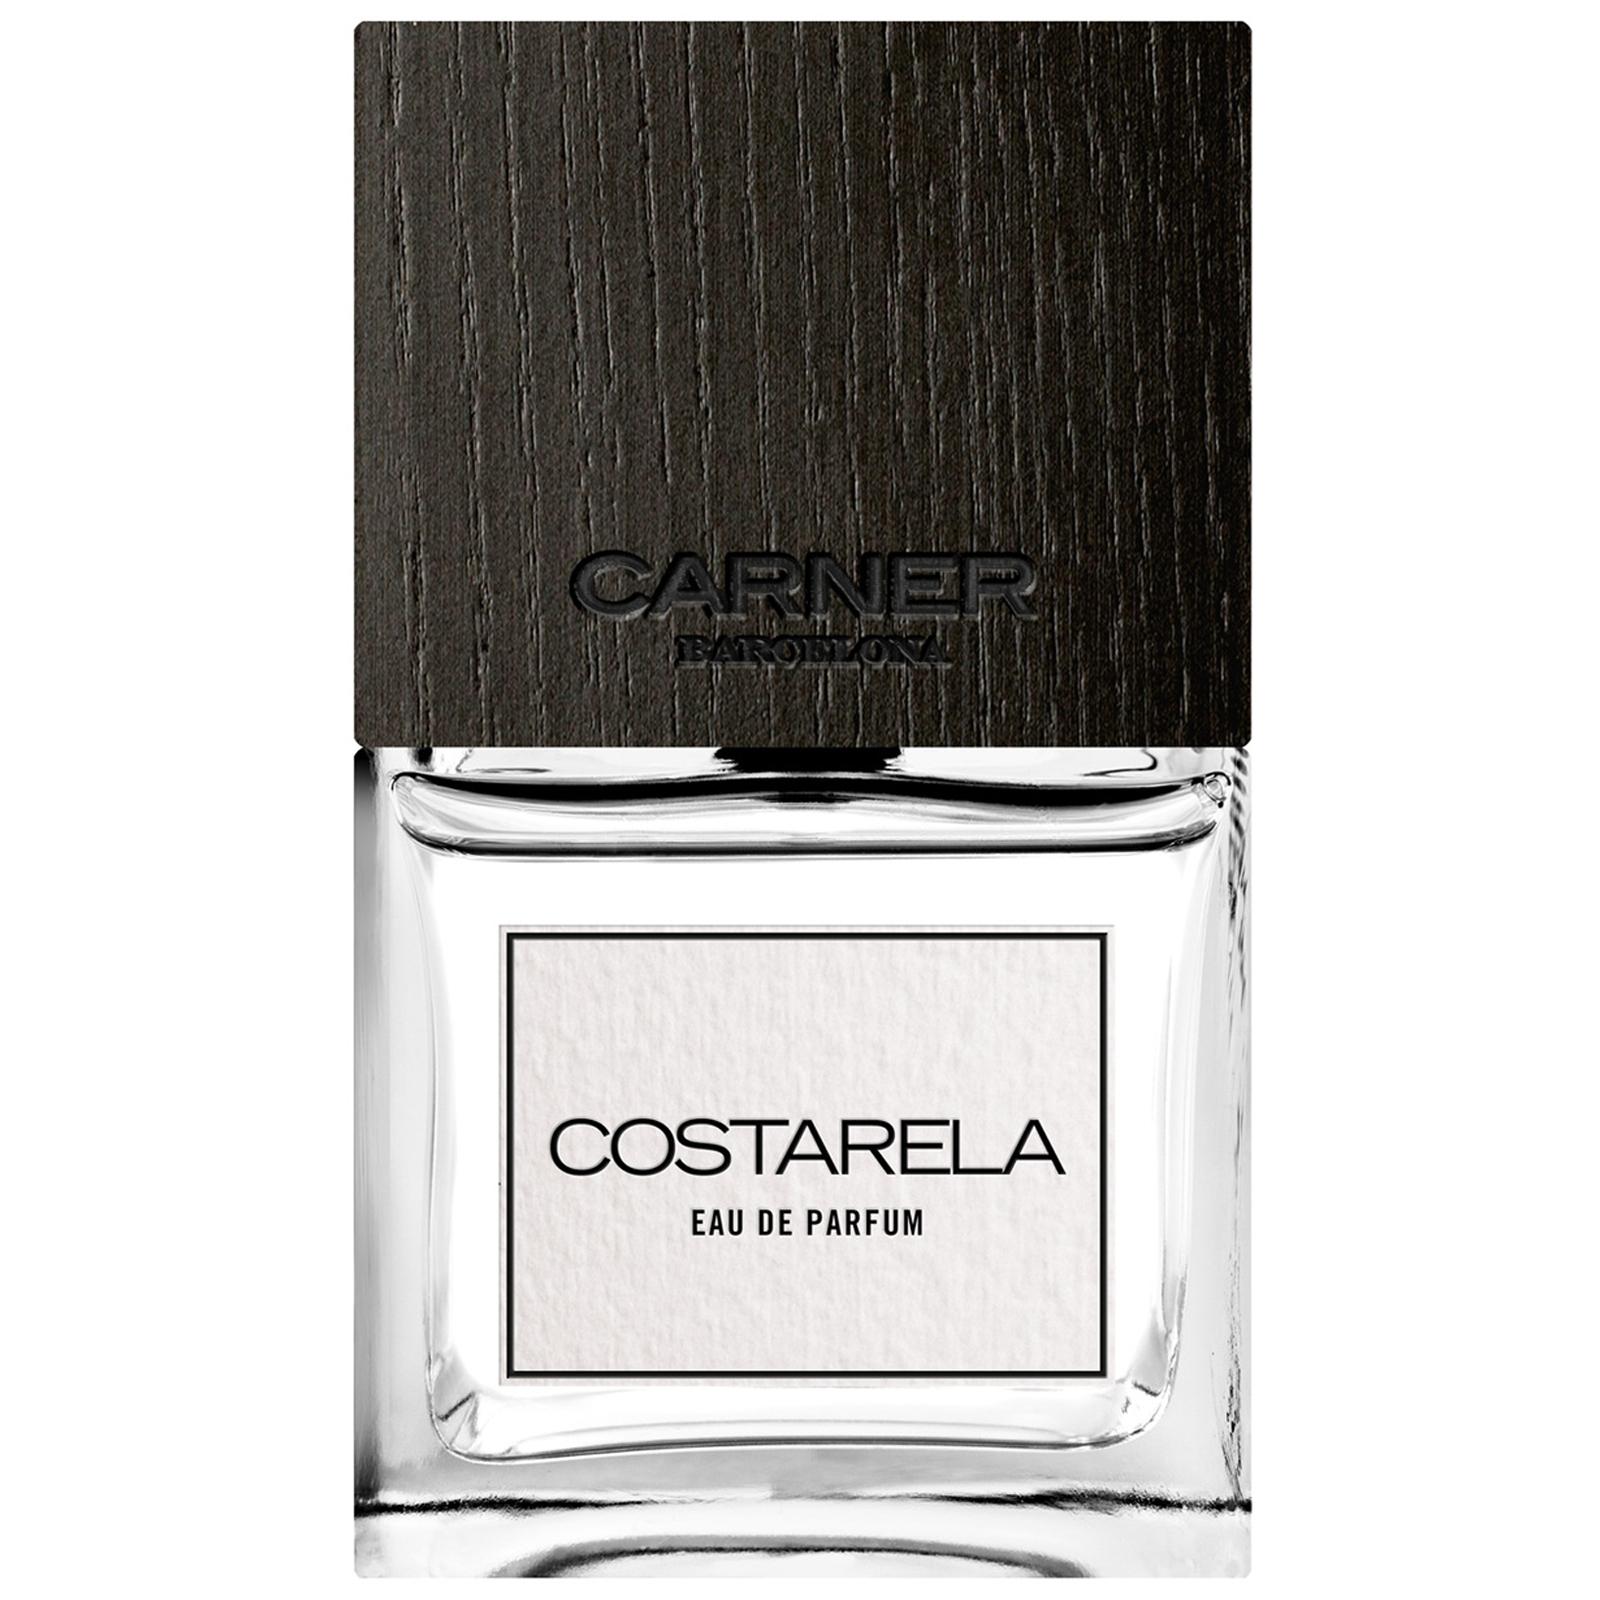 Costarela profumo eau de parfum 50 ml